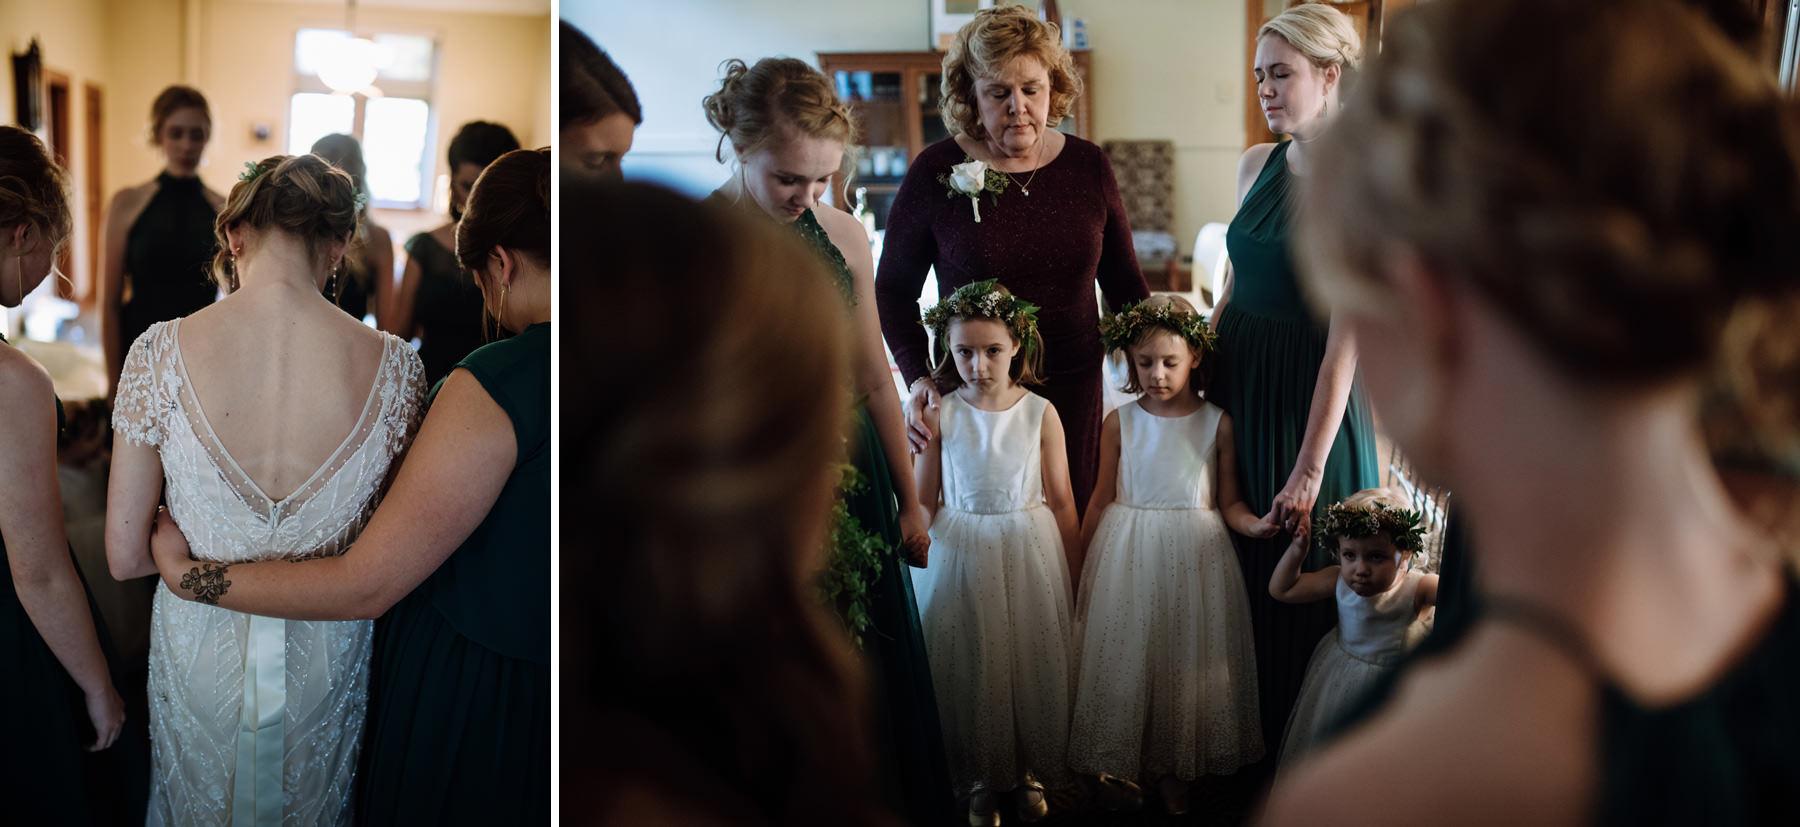 Memorial Presbyterian Wedding in St. Louis Missouri_Kindling Wedding Photography022.JPG